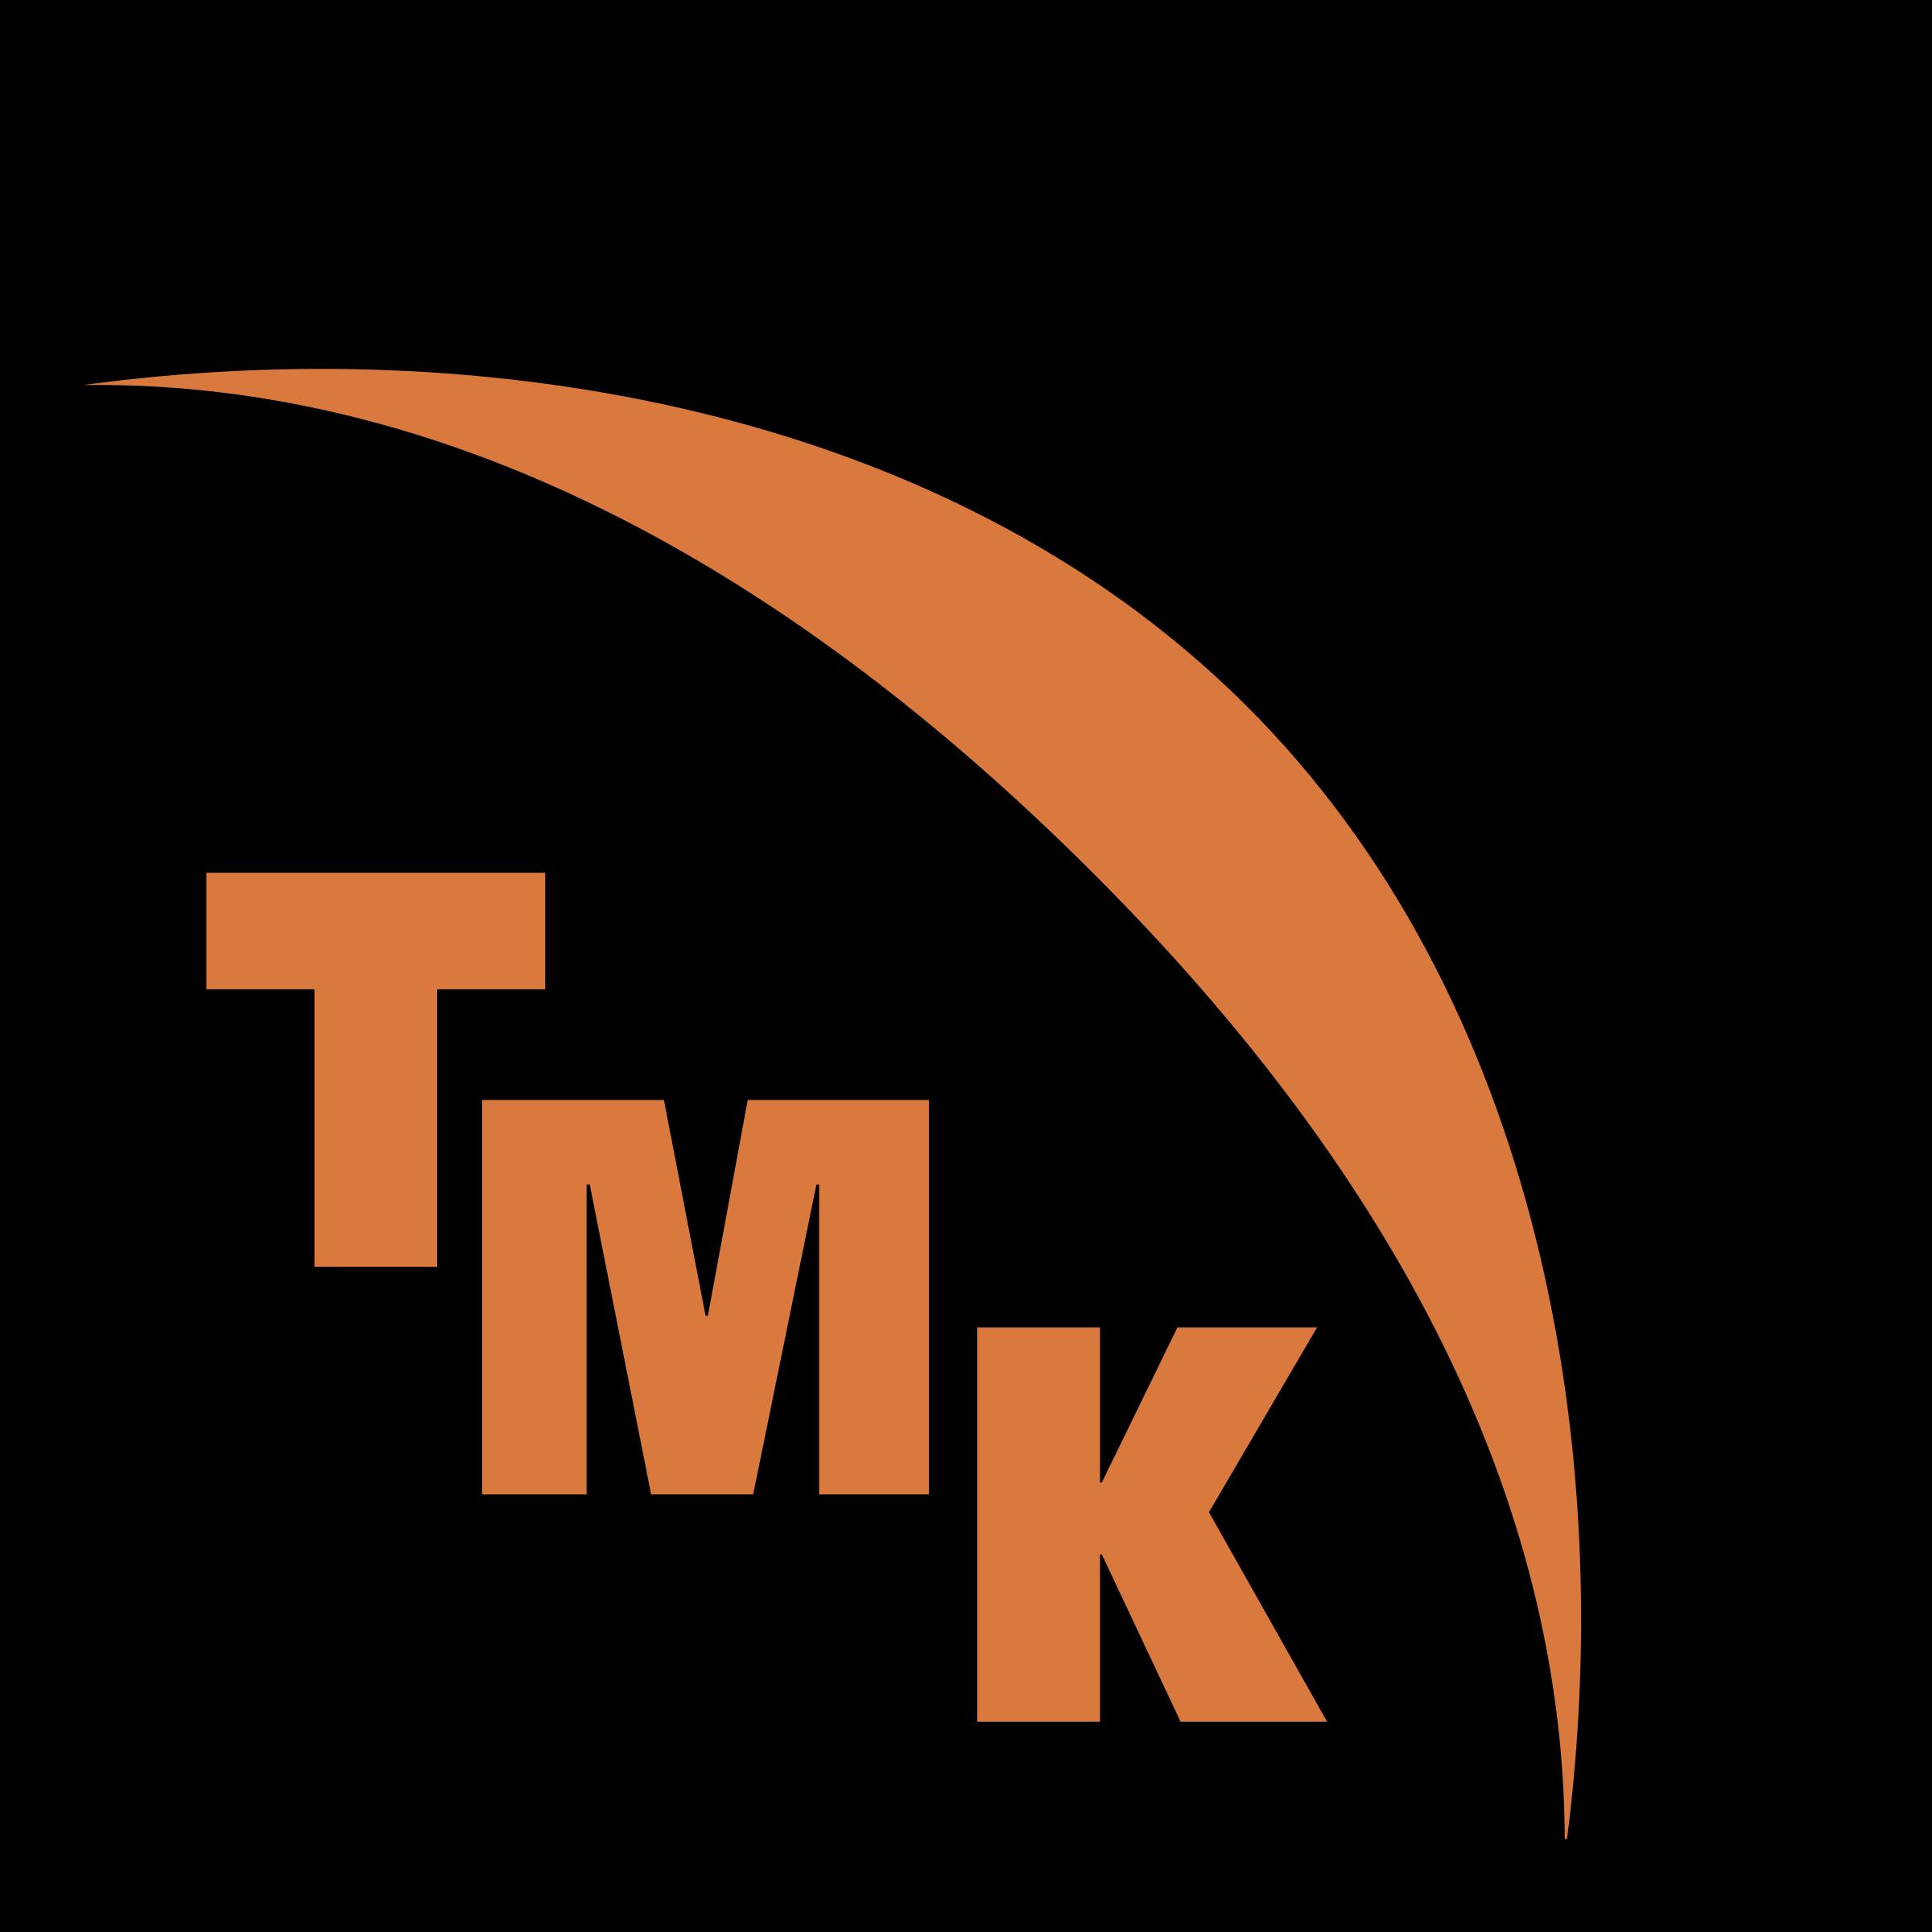 TMK Logo PNG Transparent & SVG Vector - Freebie Supply